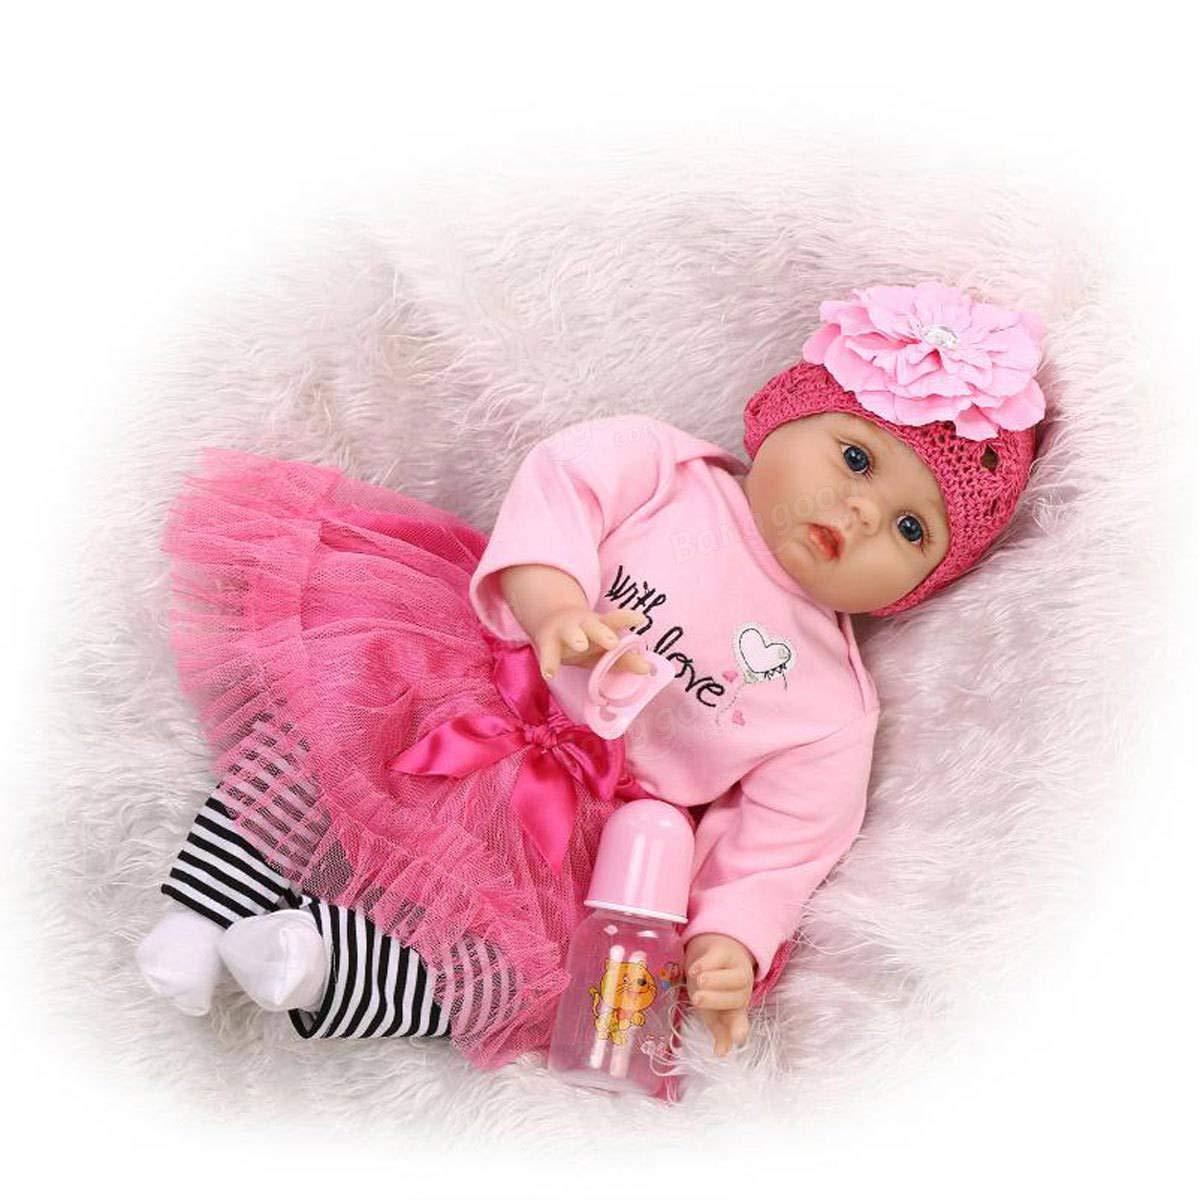 Global Brands Brands Brands Online 22  NPK DOLL Realistische handgemachte Reborn Baby Girl Puppe Spielzeug lebensechte Soft Silikon Viny 744b8b